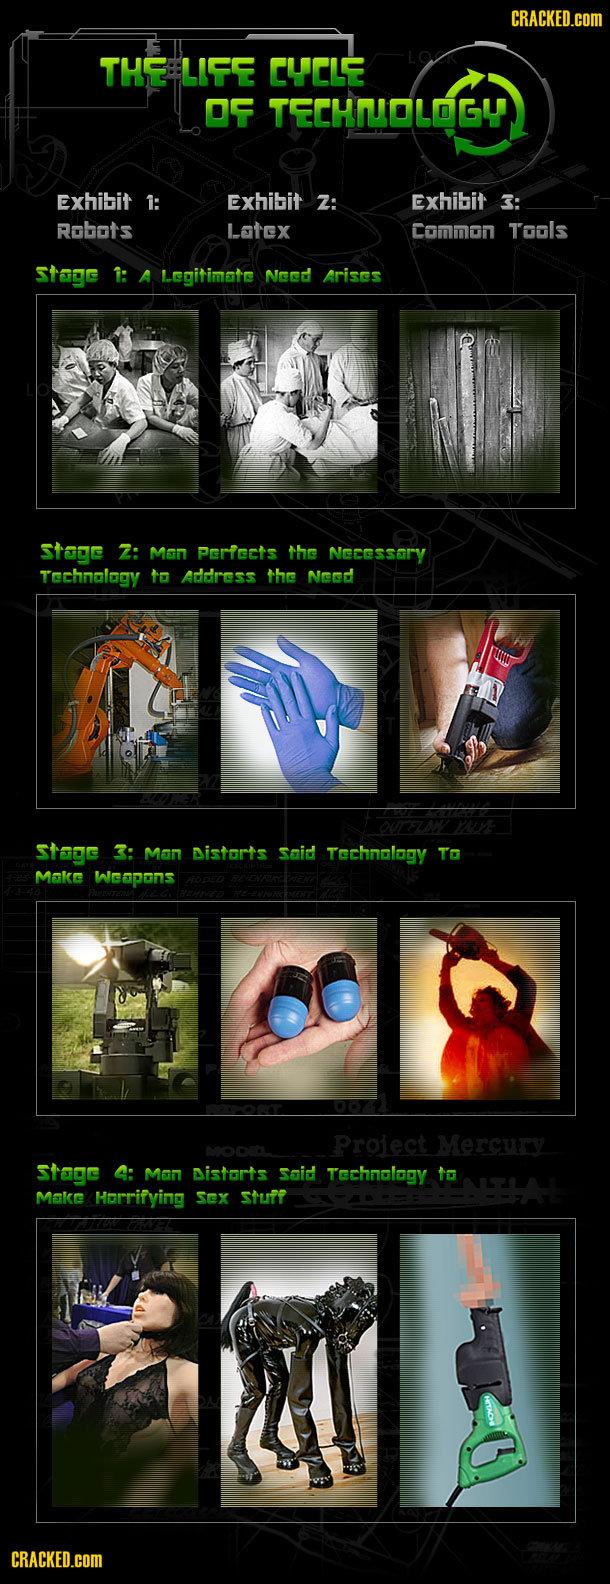 history of technology. thumbs if you like. Exhibit l; Exhibit Tr. Exhibit E: ereht. ree